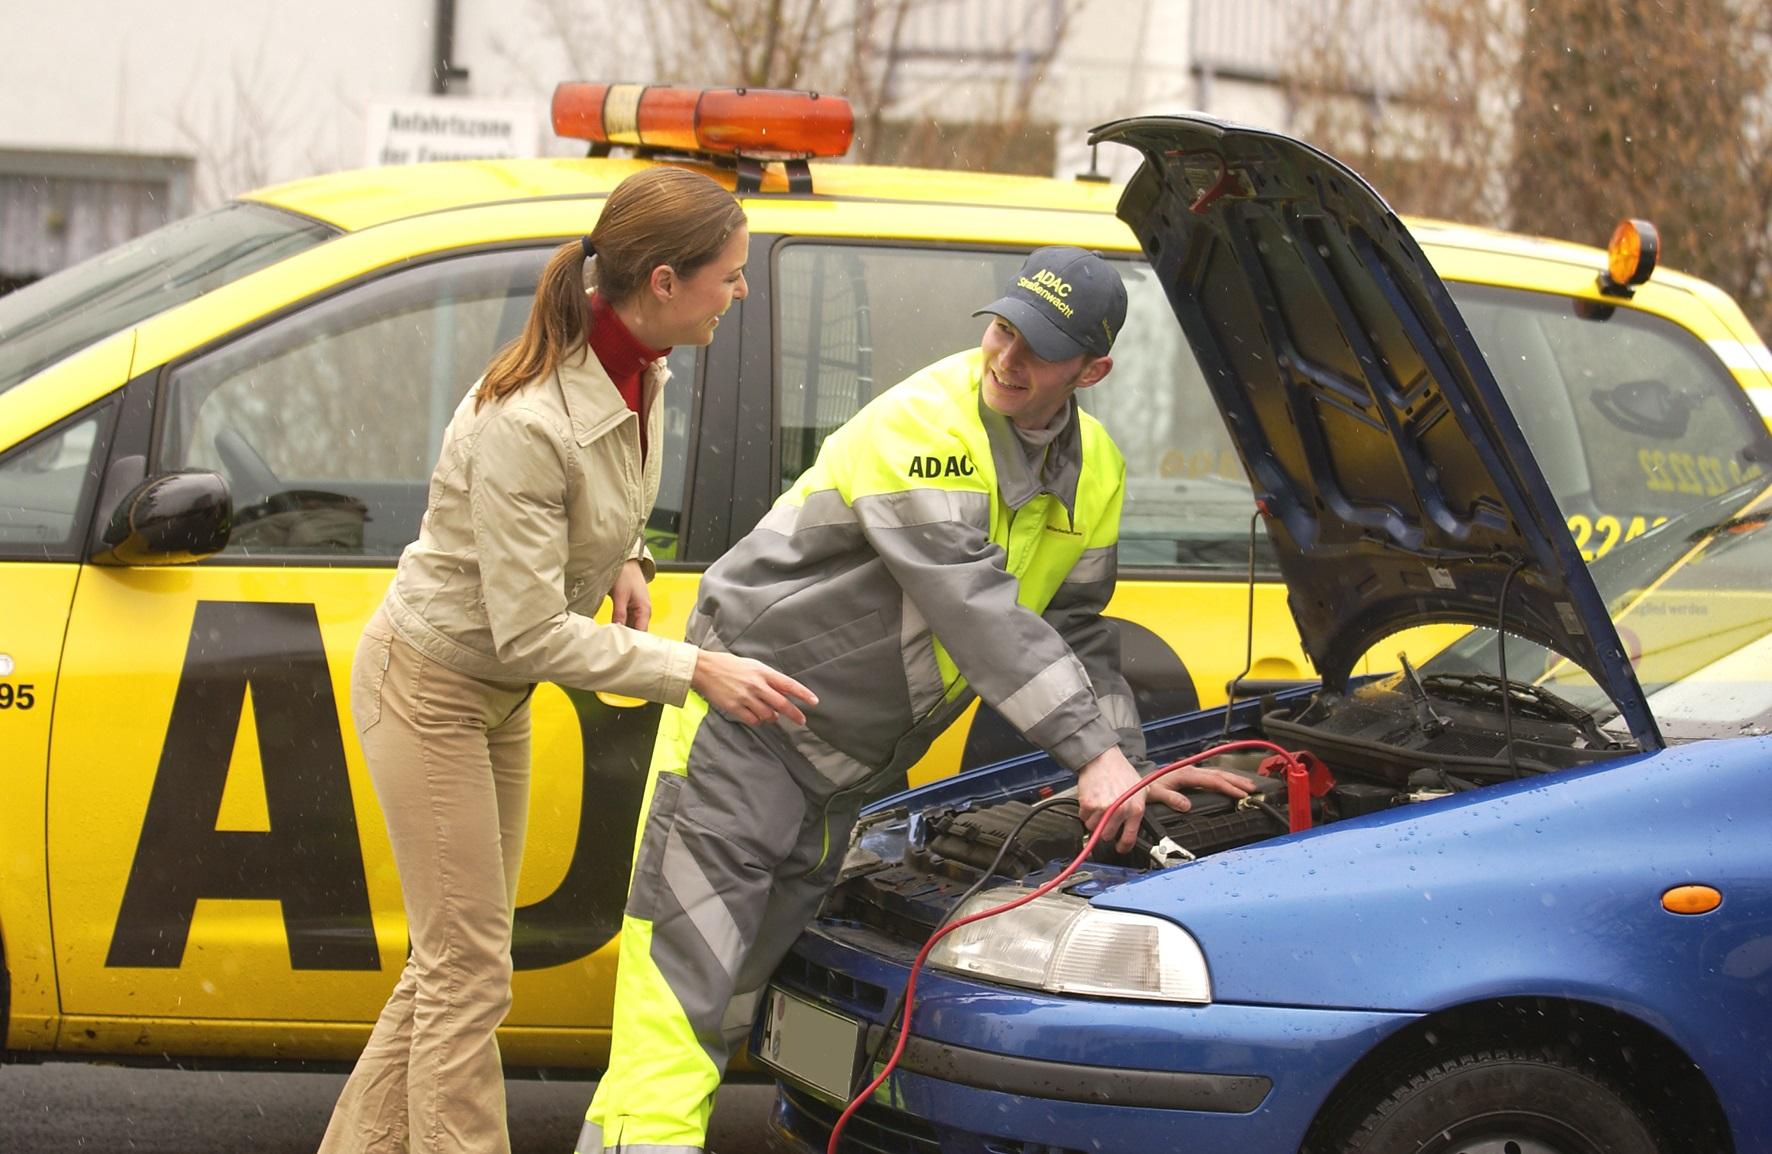 Tysk vejtjeneste: Her de danske skader på bilferien